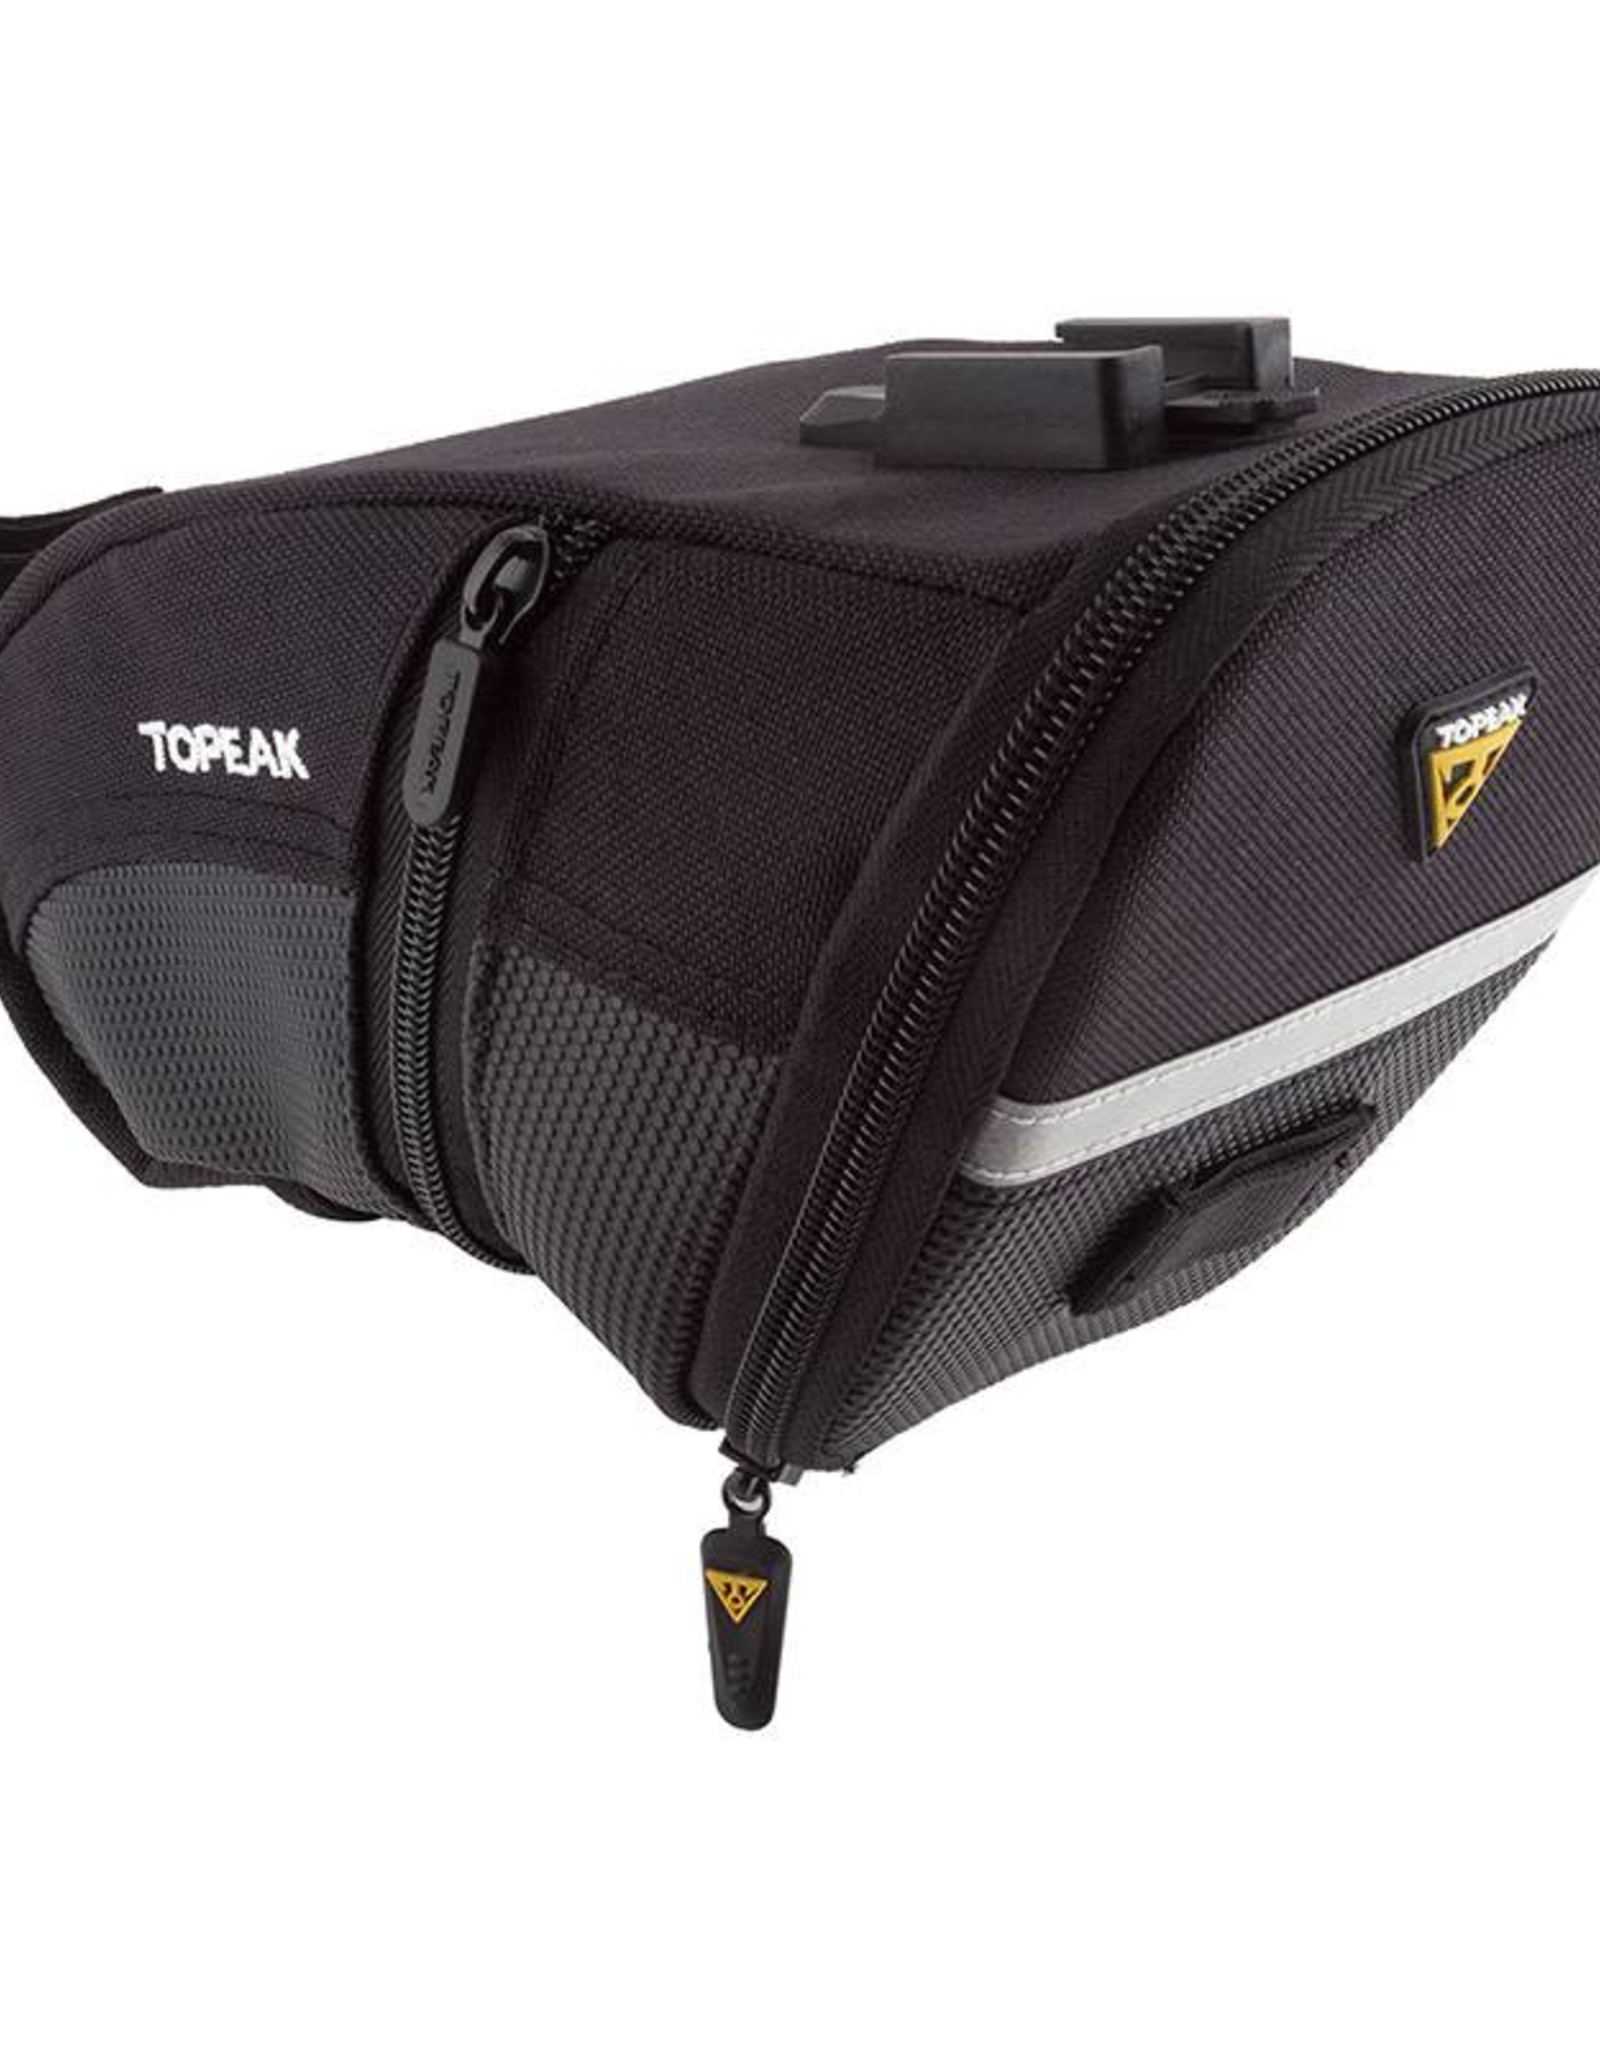 Topeak Topeak Aero Wedge Seat Bag LG